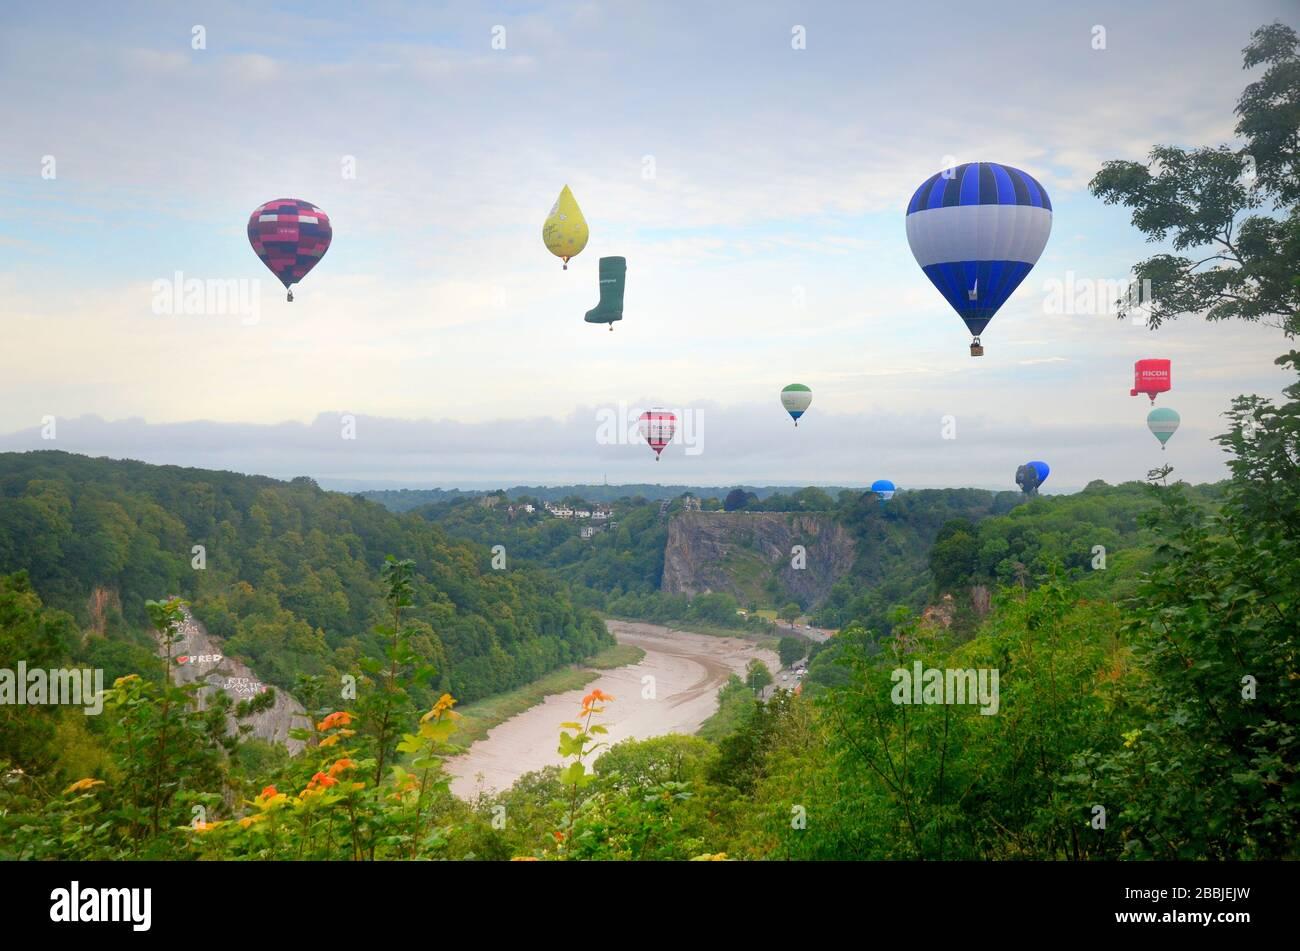 Bristol ballon festival 2019 - hot air balloons landing after flight. - clifton Stock Photo